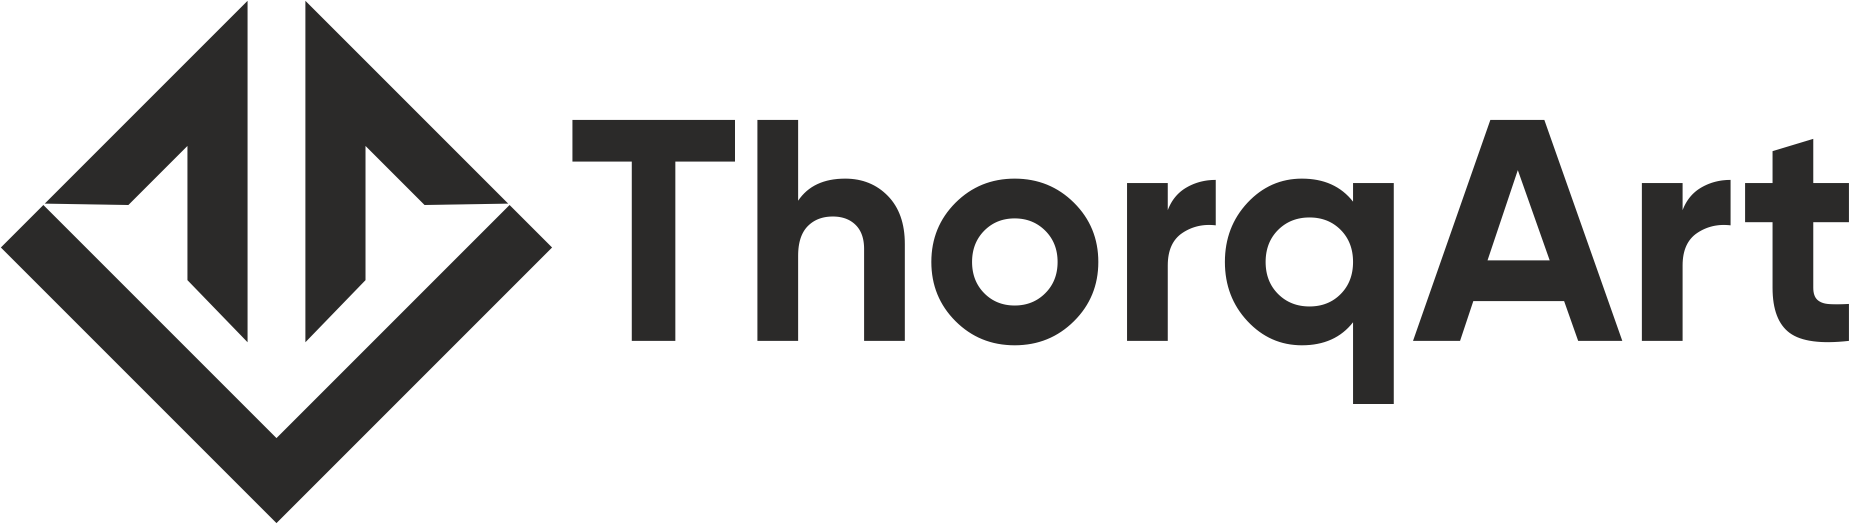 Thorqart